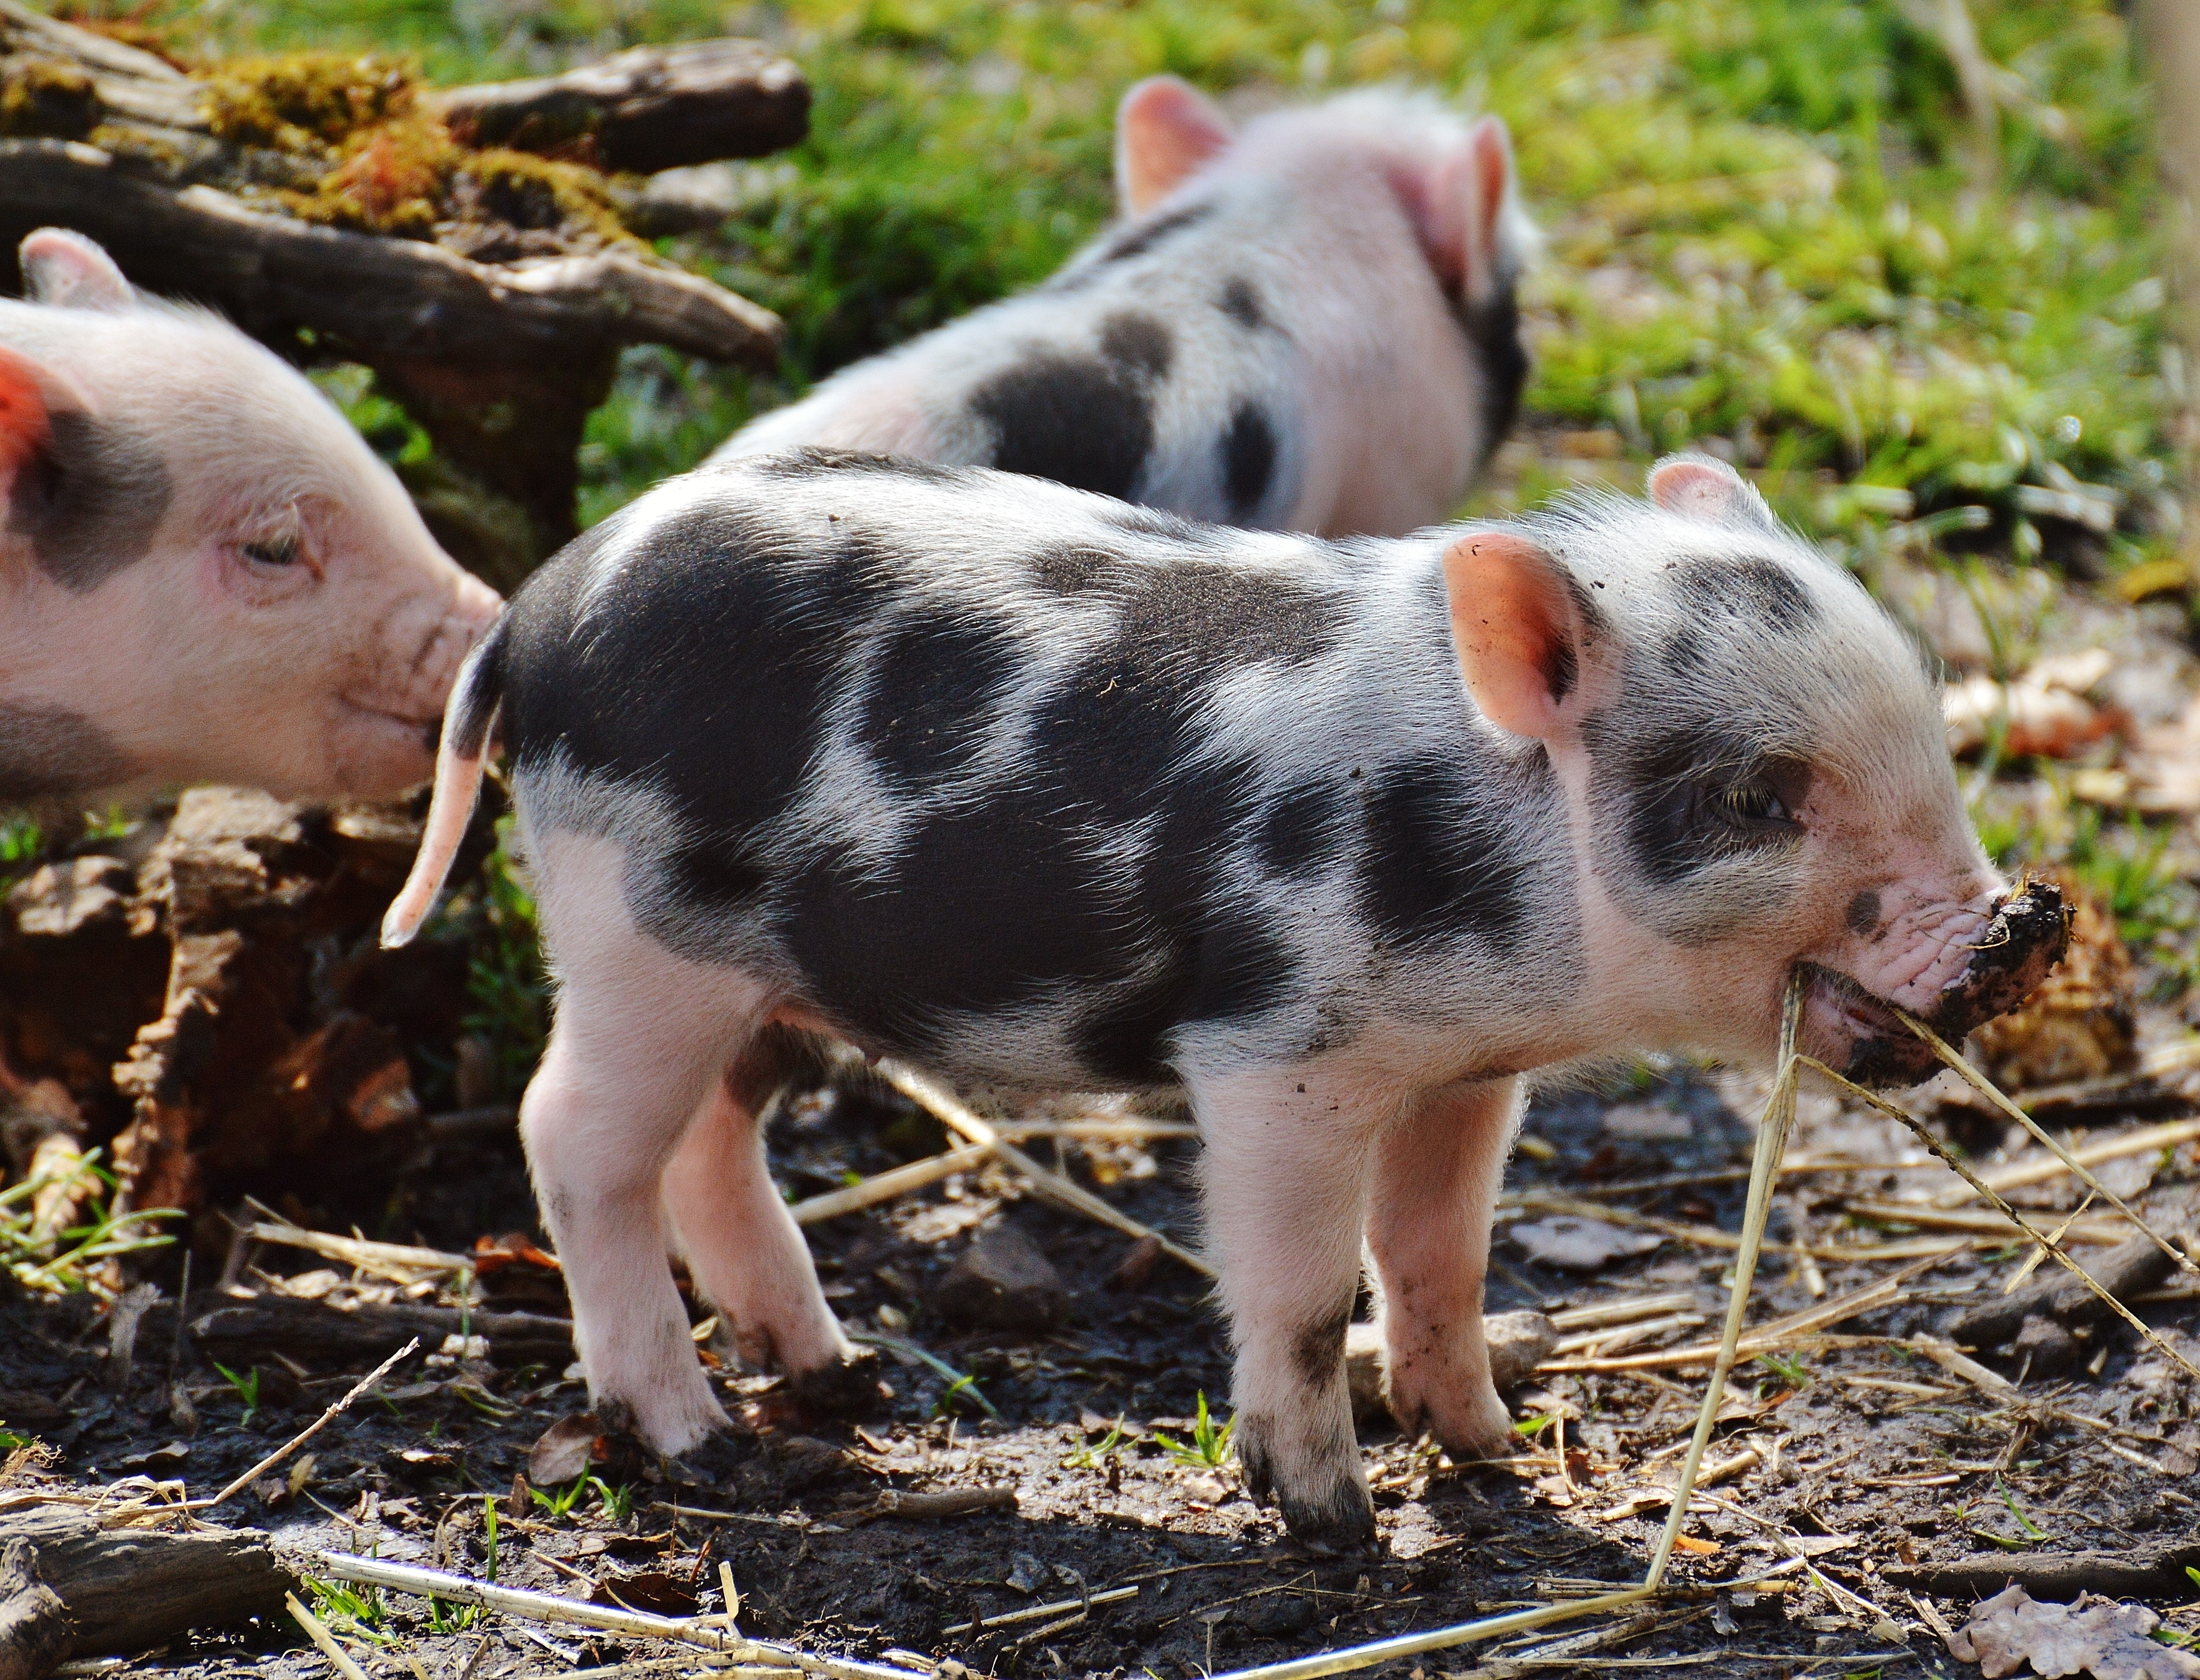 Baby Pig Wallpaper - 4642x3545 ...